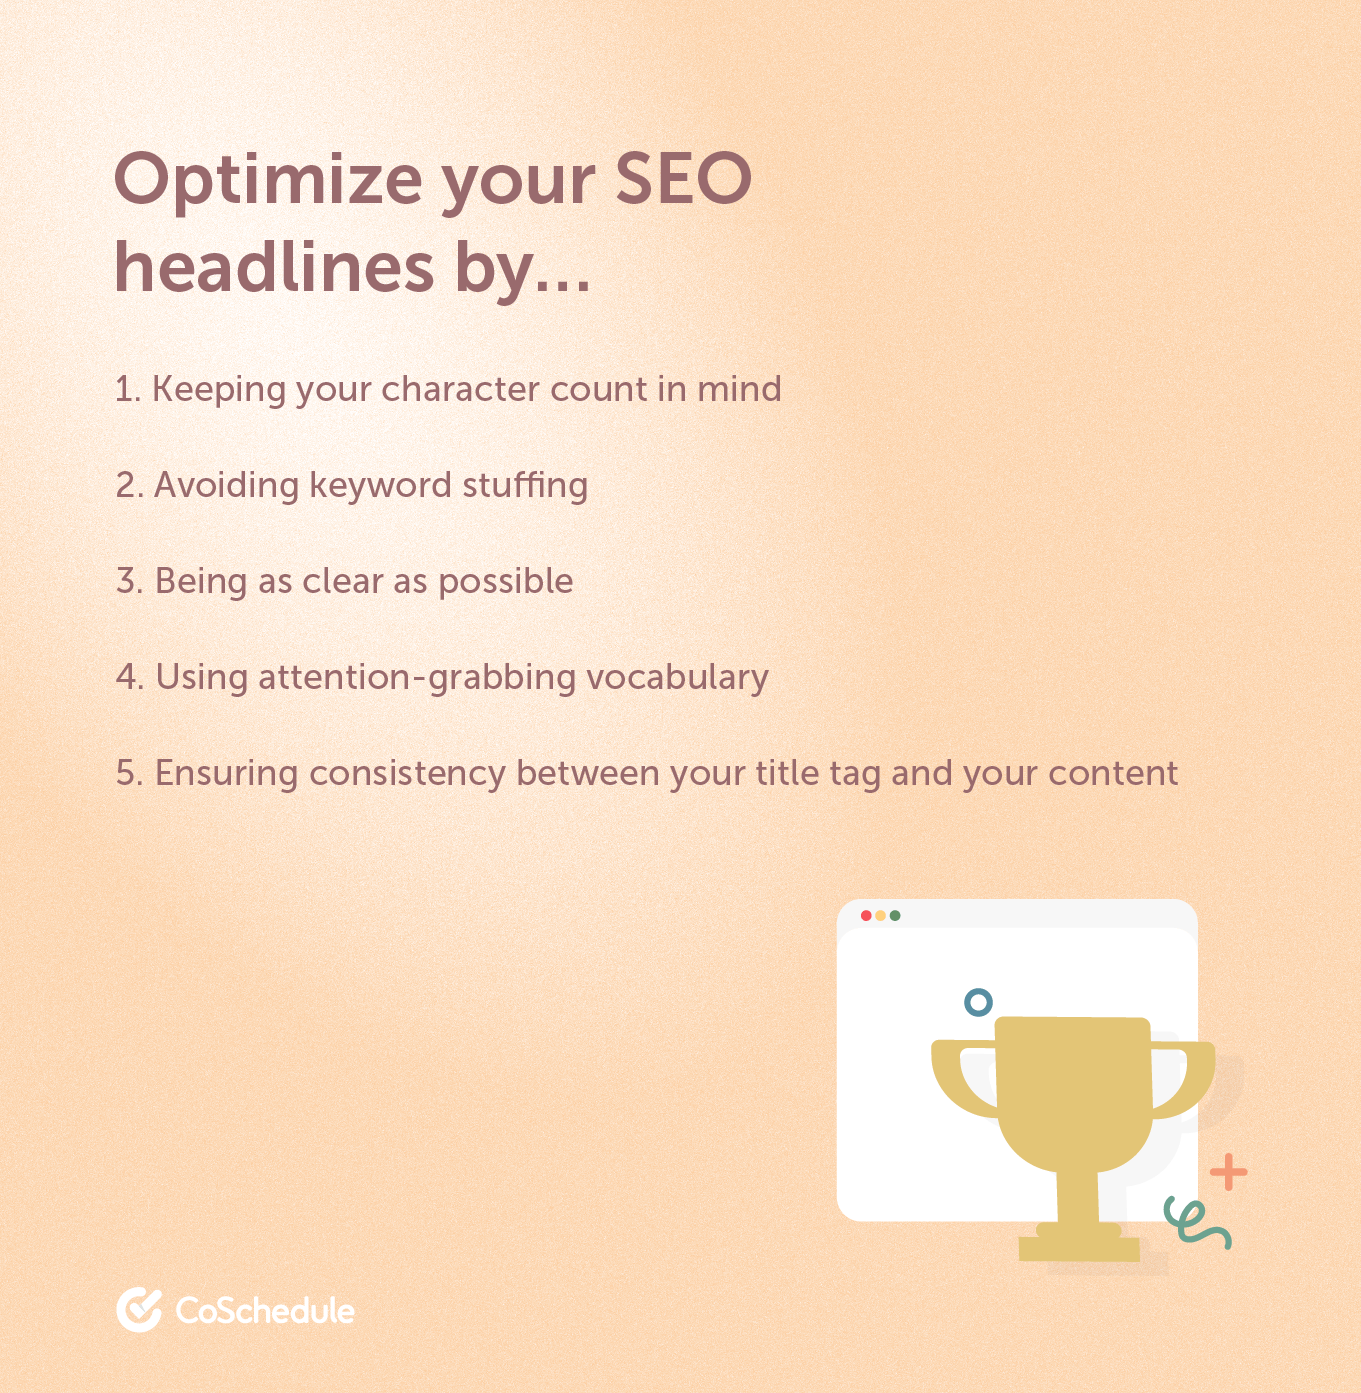 Optimize SEO Headlines